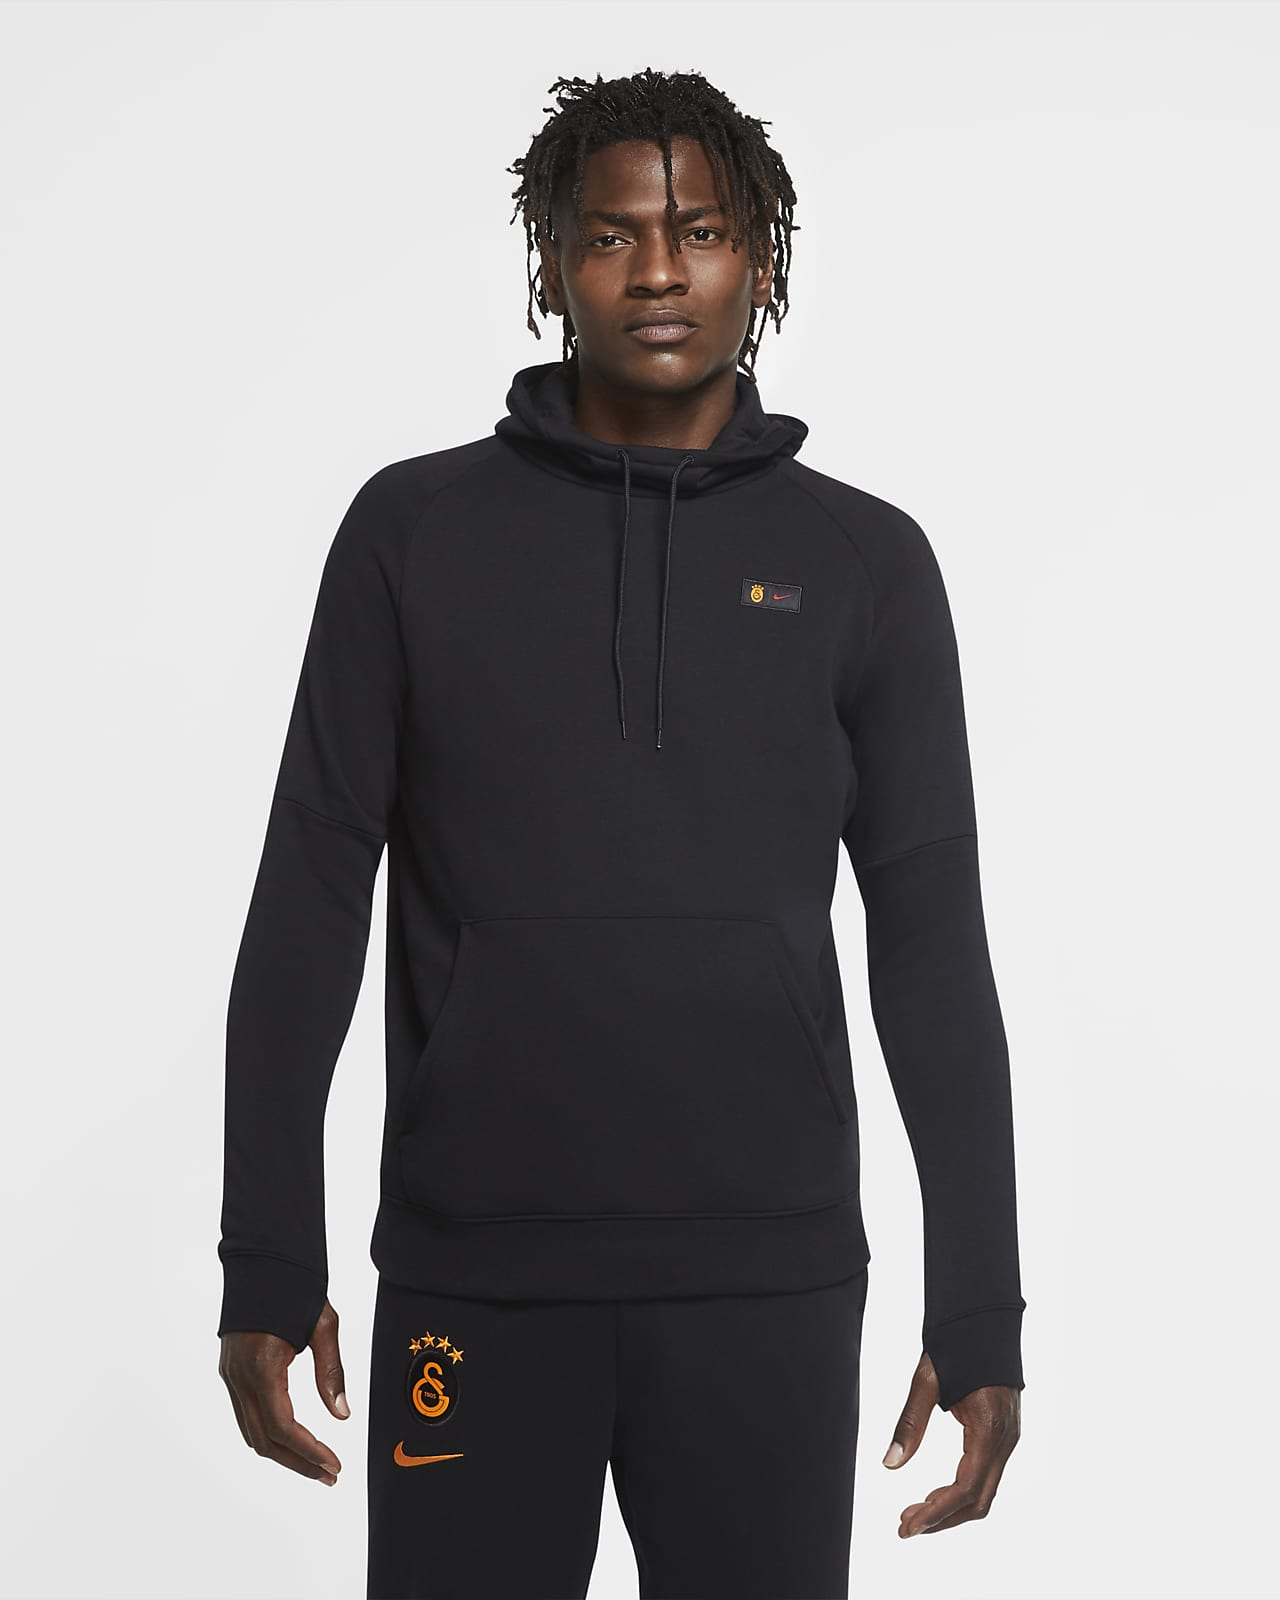 Galatasaray Men's Fleece Pullover Football Hoodie